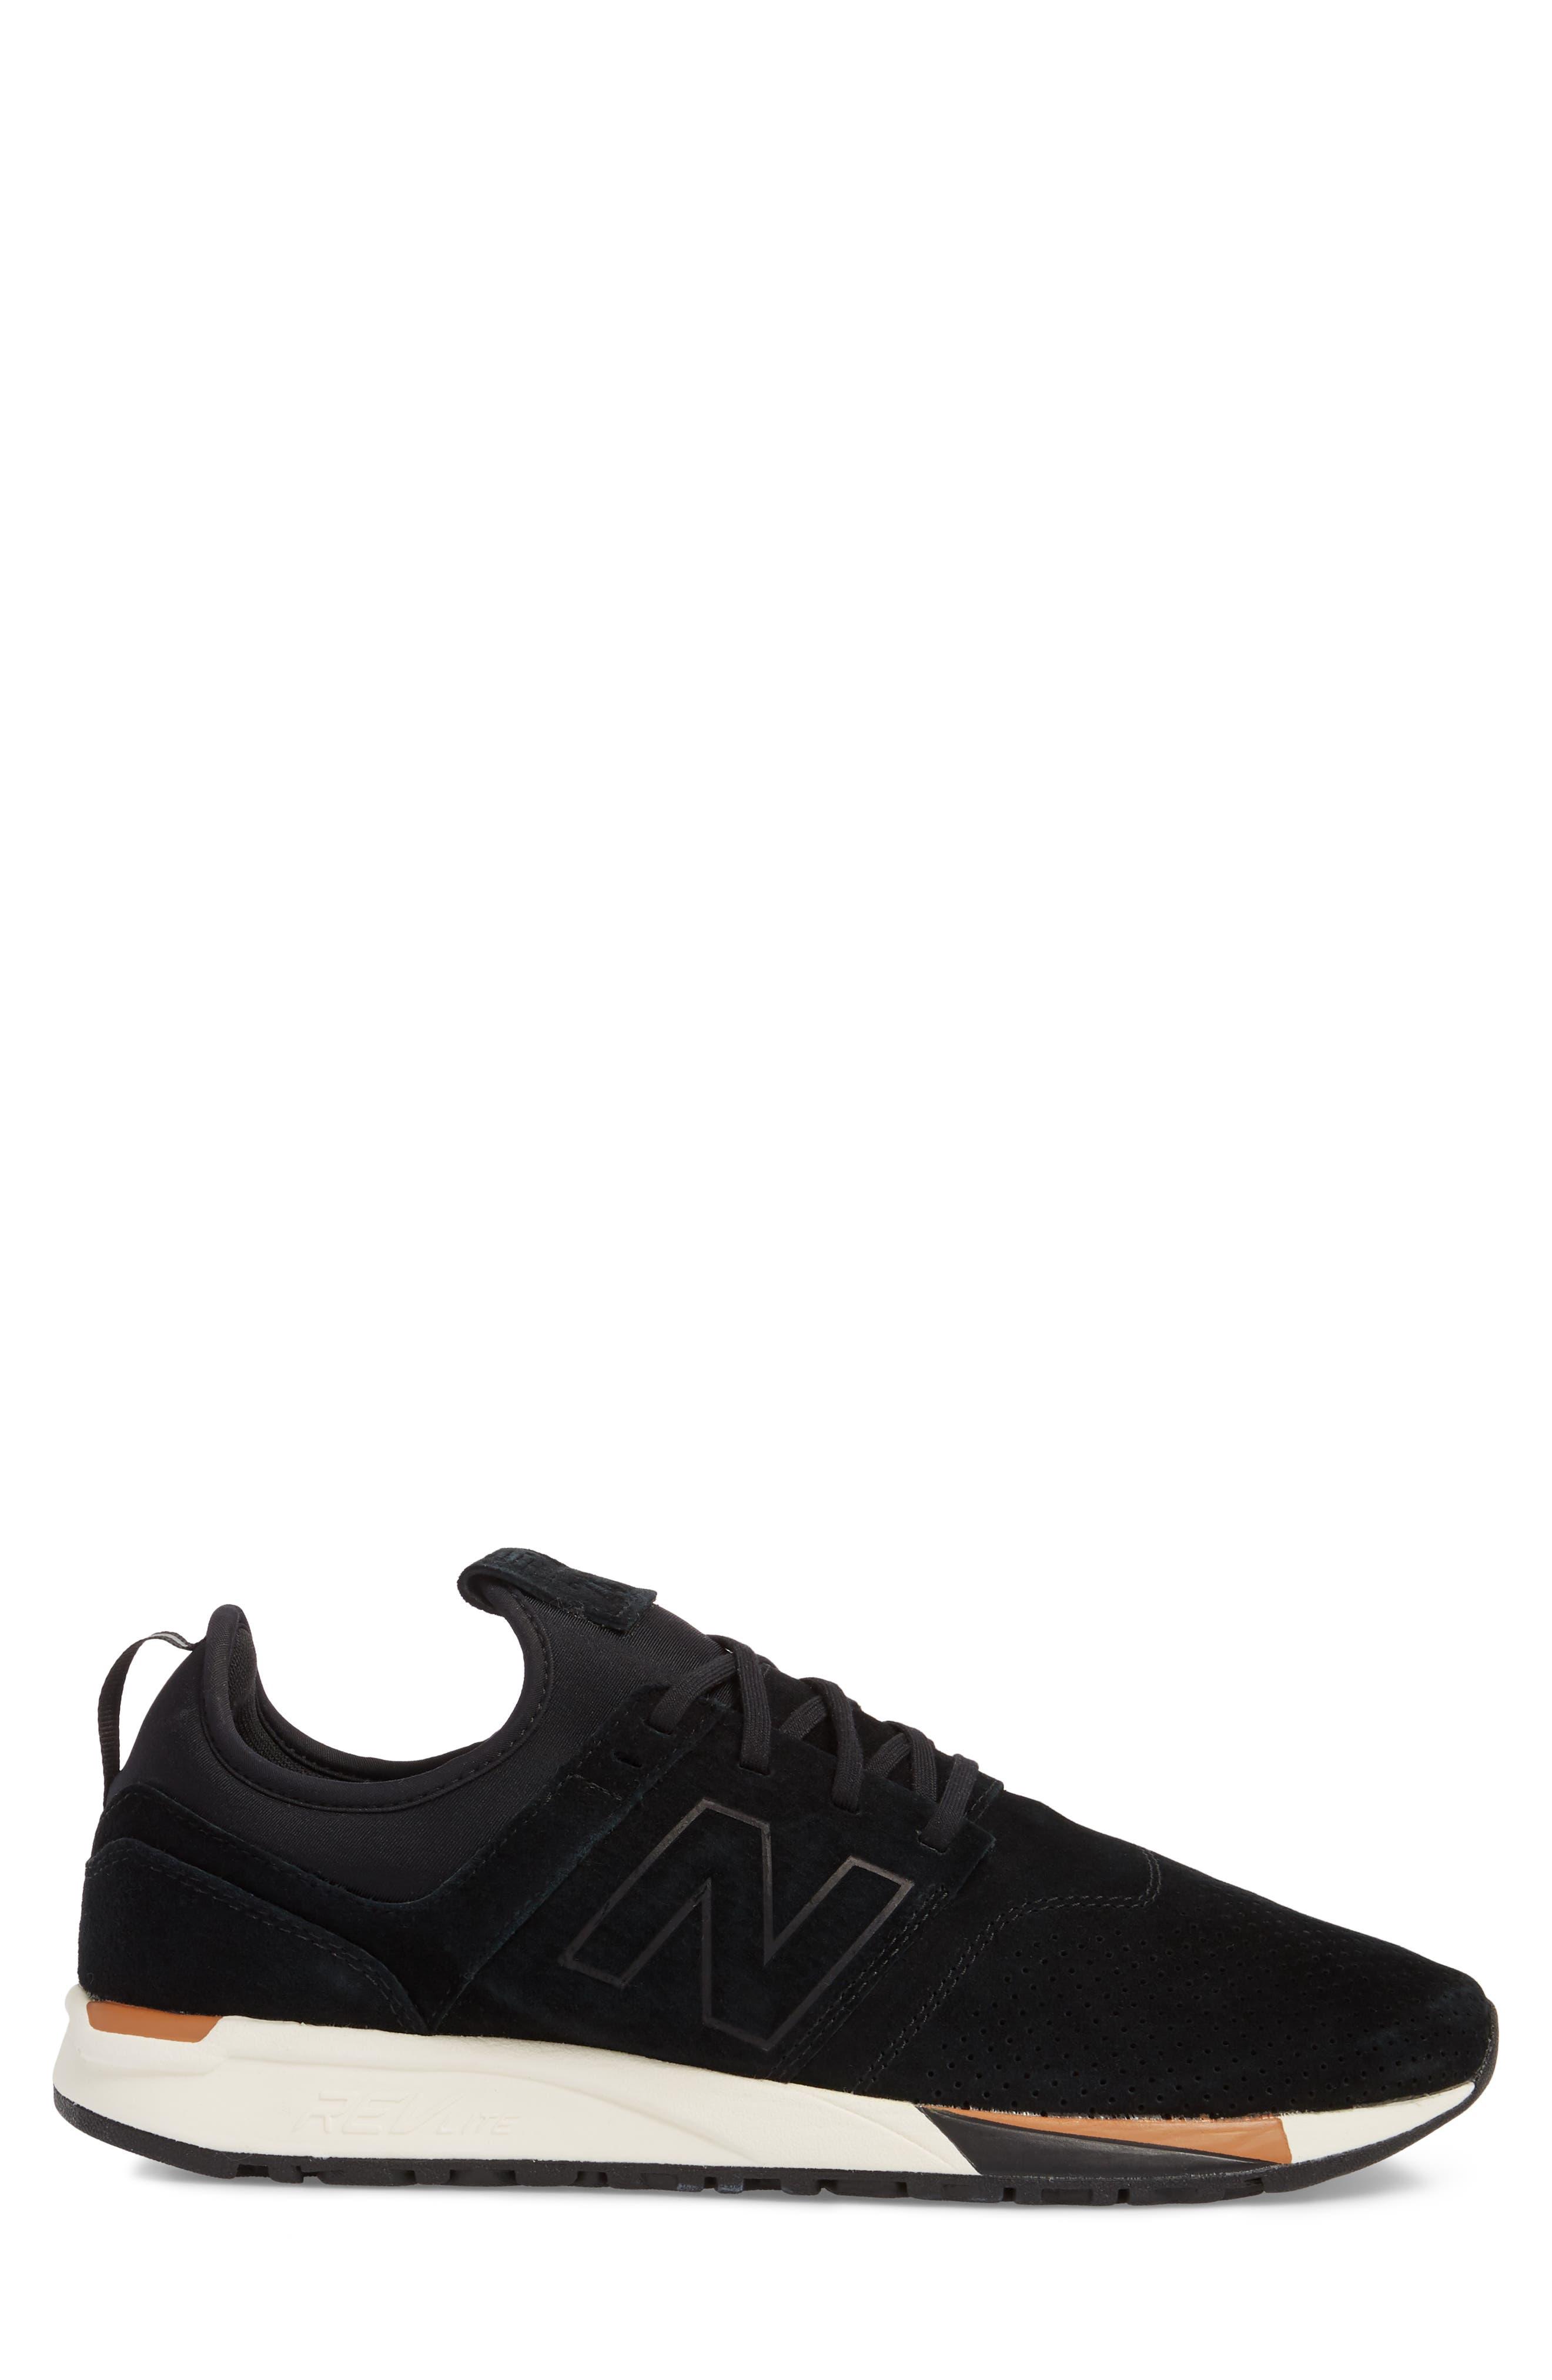 247 Luxe Sneaker,                             Alternate thumbnail 3, color,                             BLACK